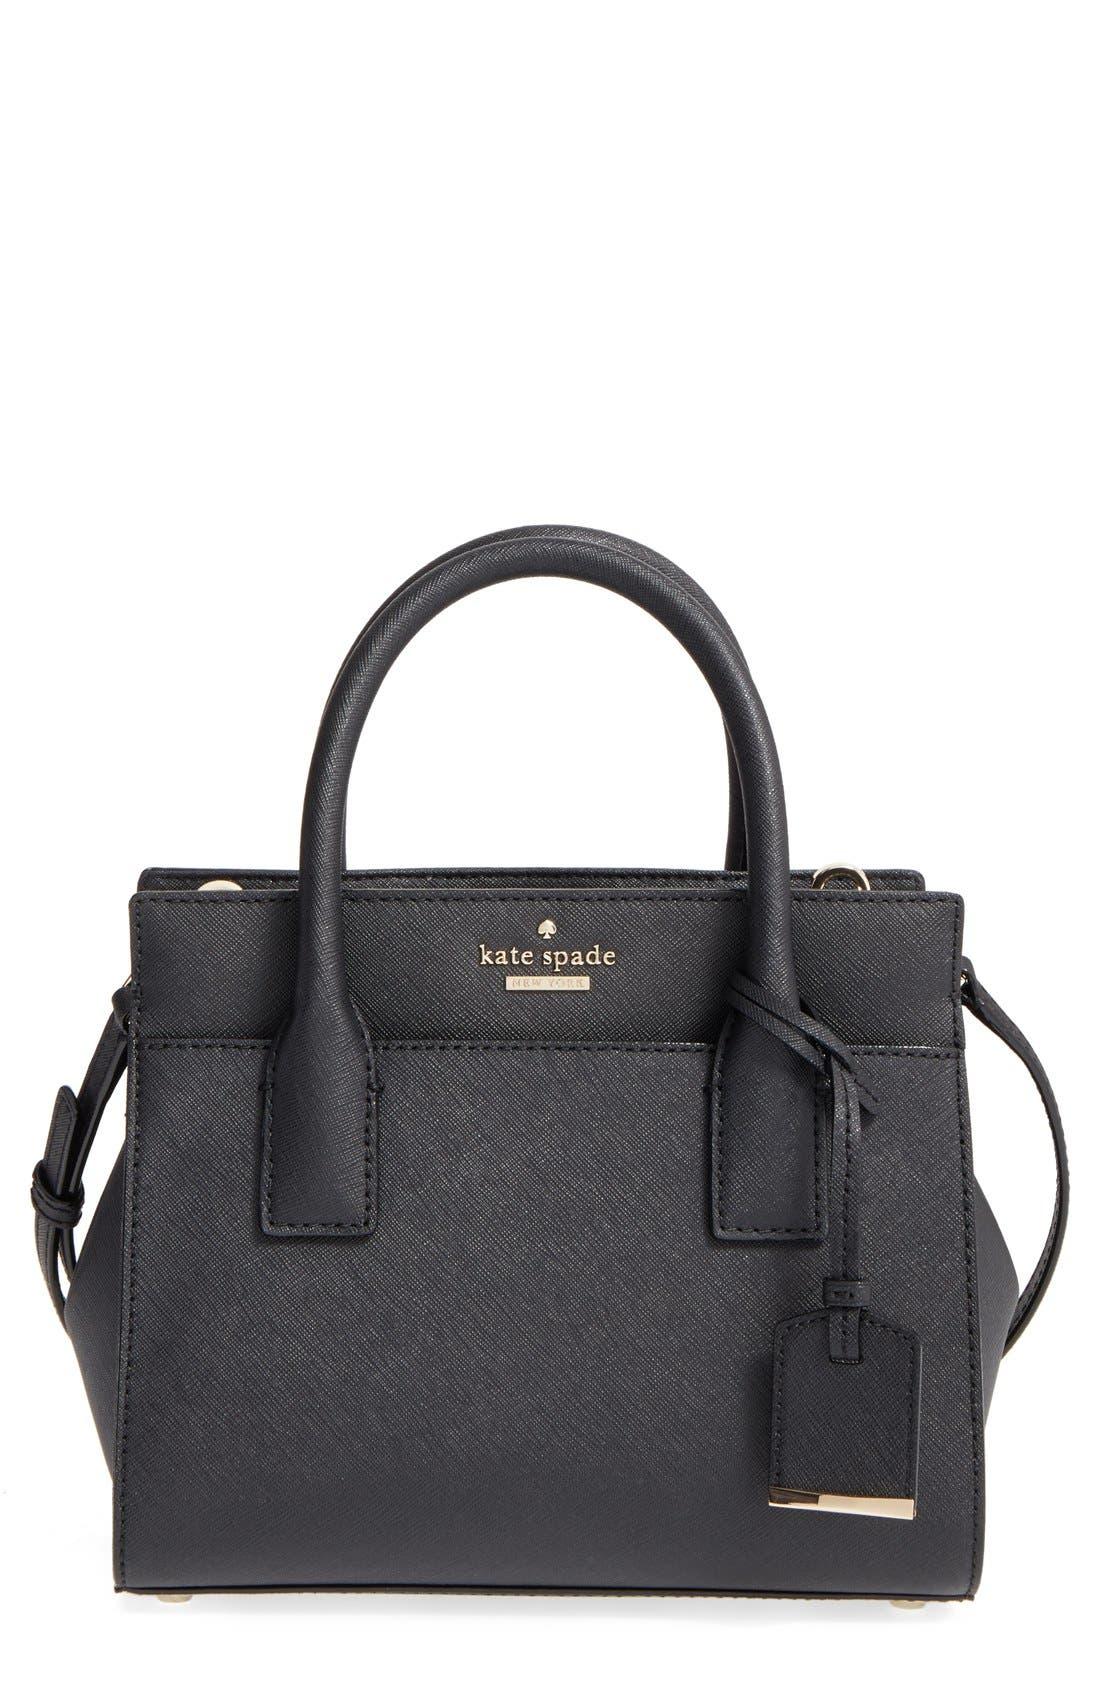 Main Image - kate spade new york 'cameron street - mini candace' leather satchel